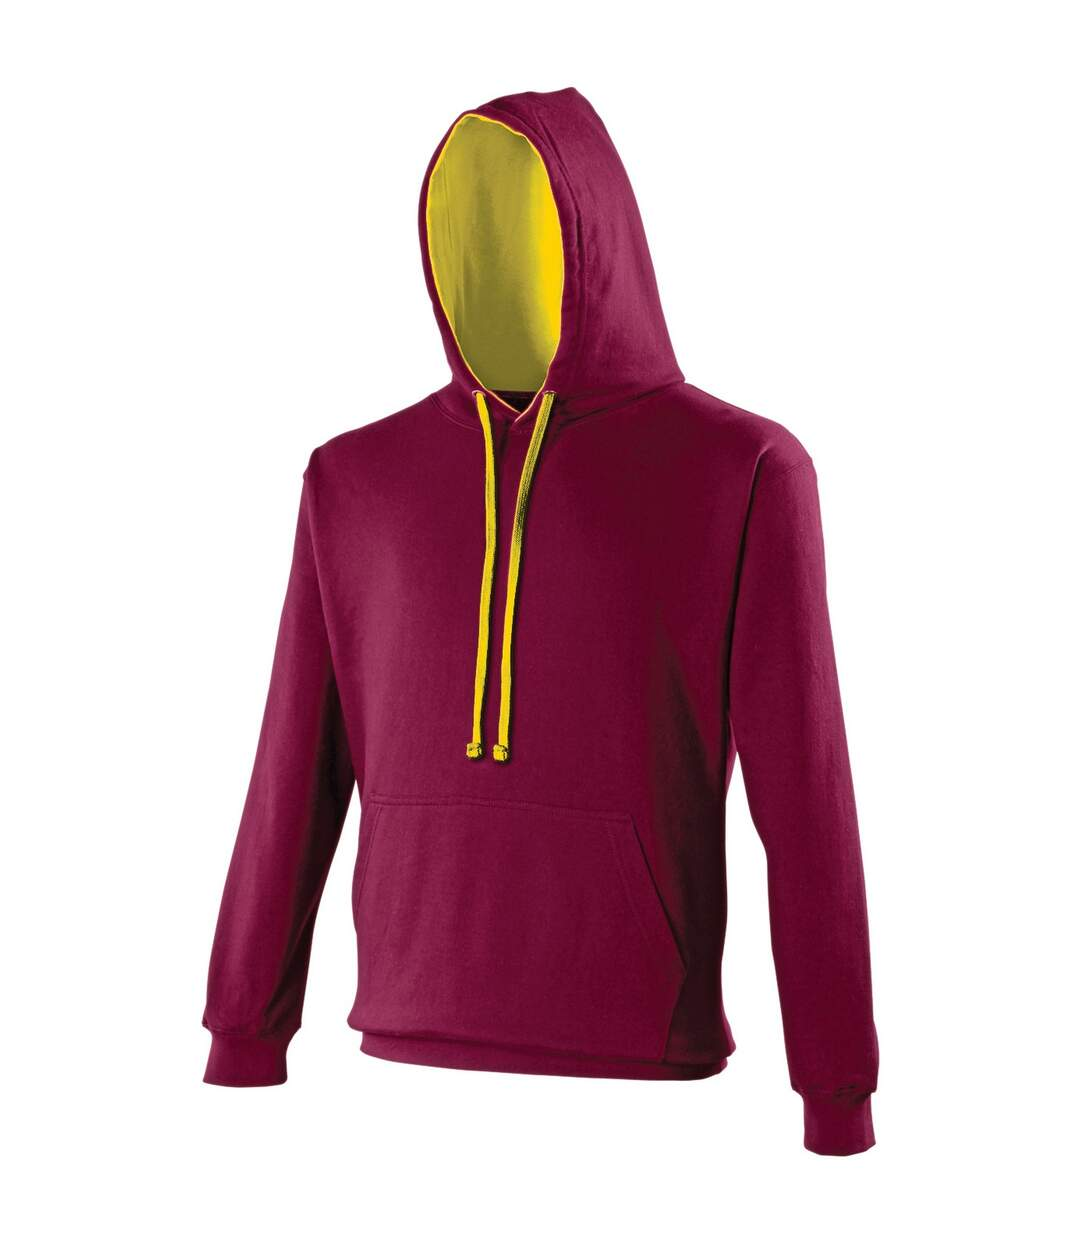 Awdis Varsity Hooded Sweatshirt / Hoodie (Lime Green/Magenta Magic) - UTRW165